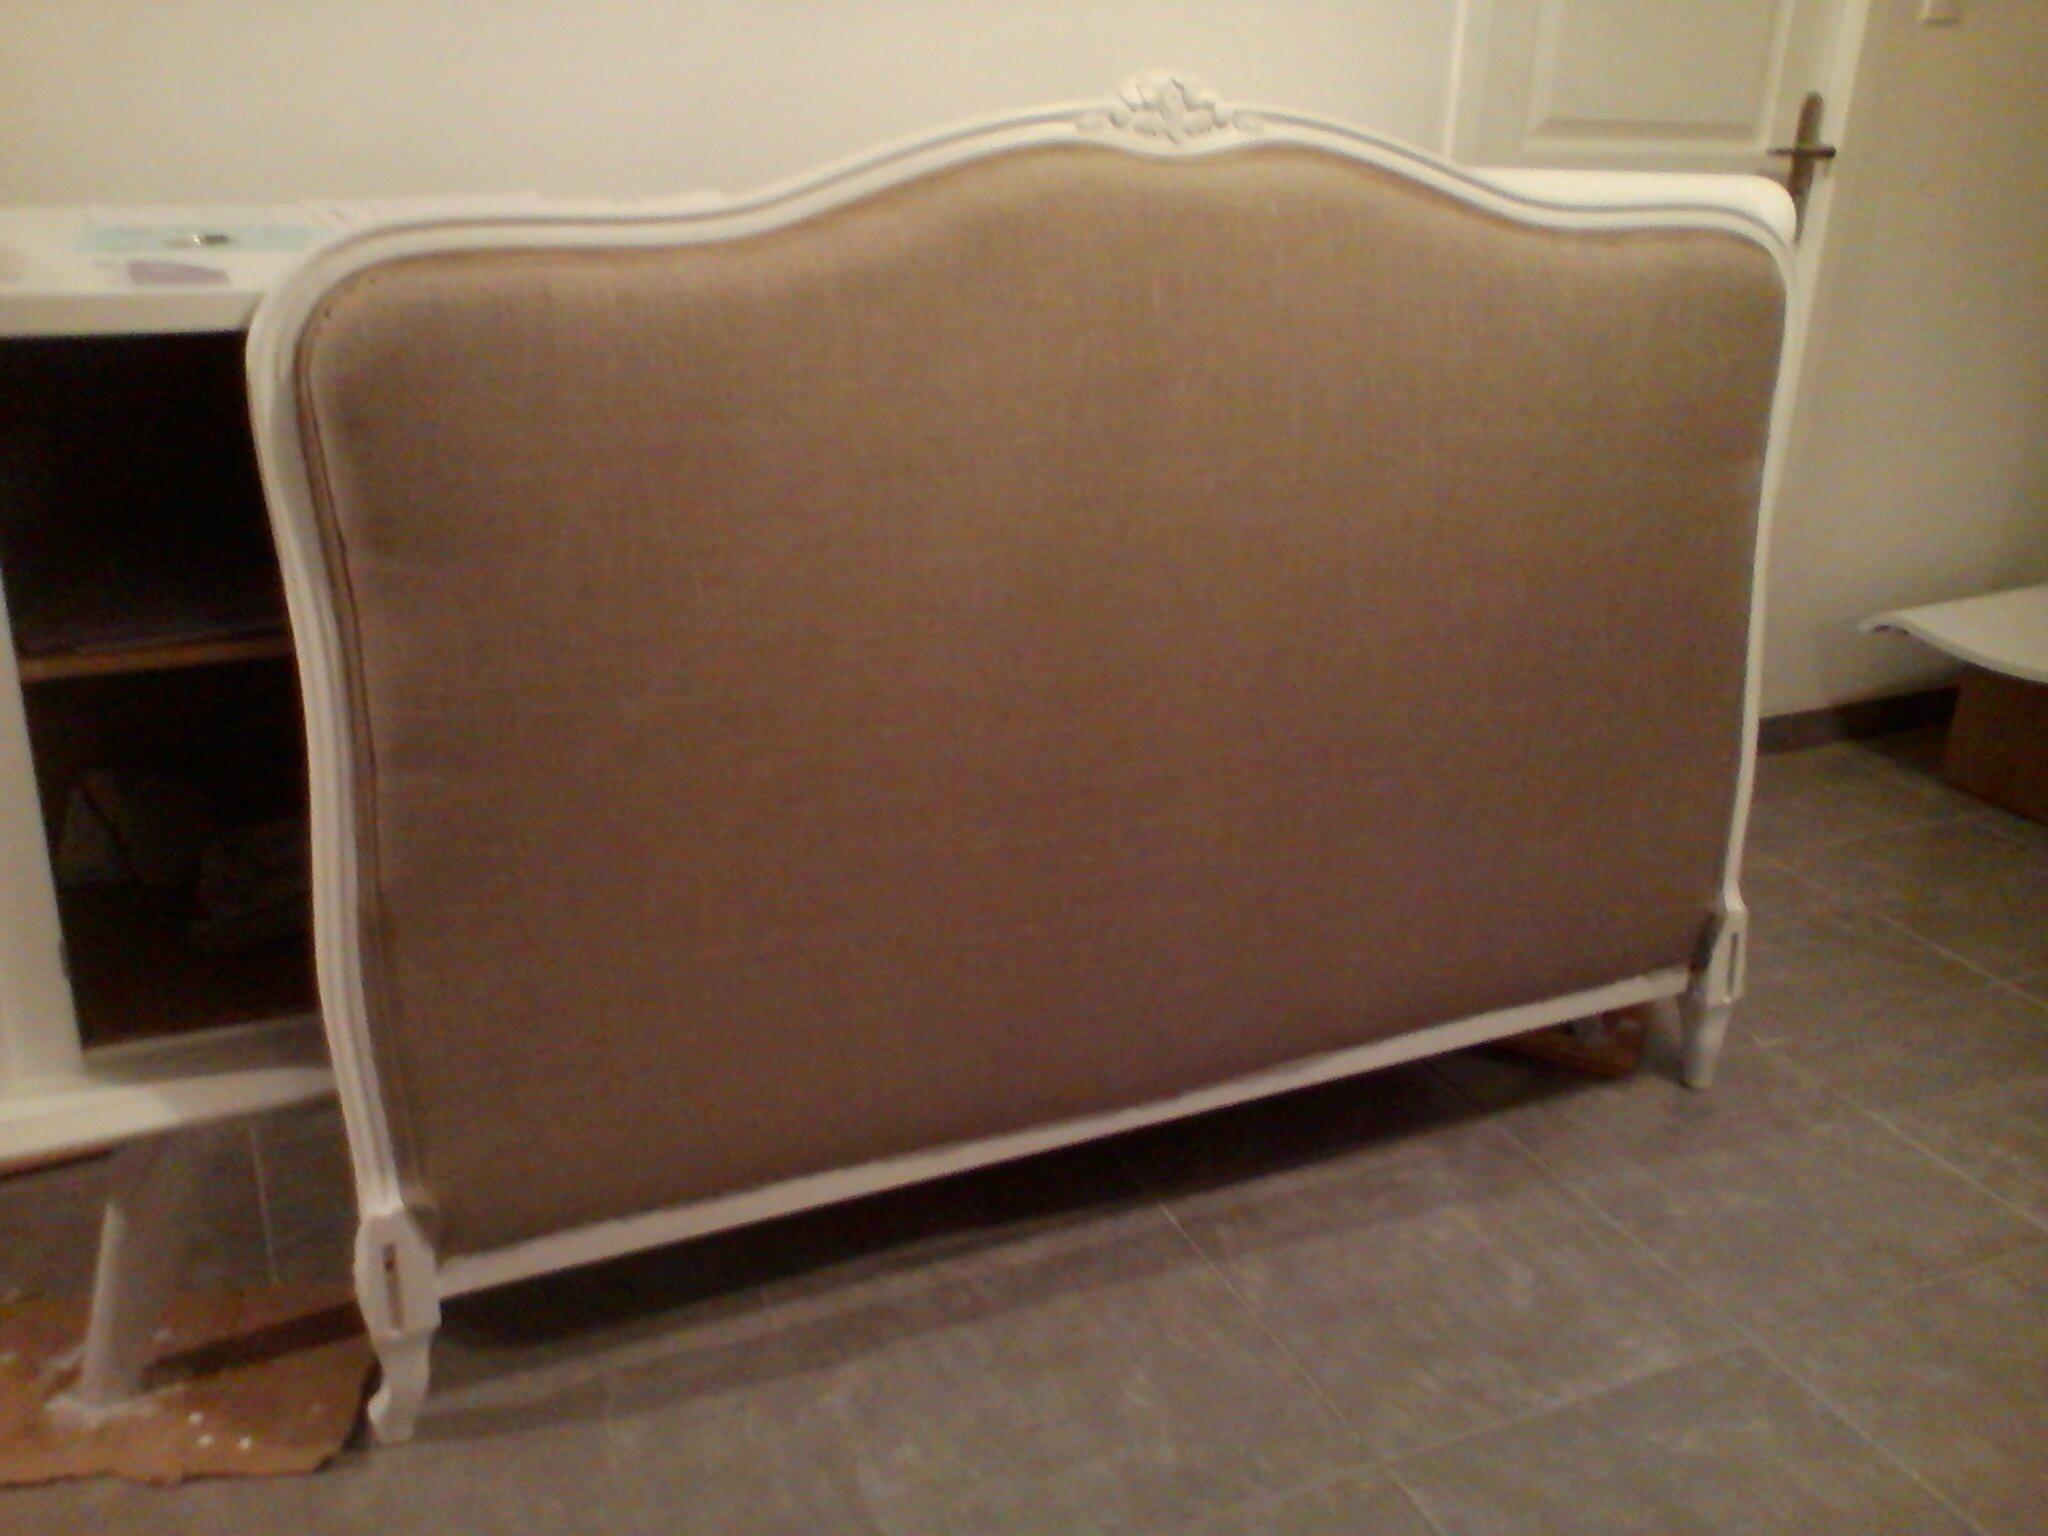 tuto tapisser une t te de lit diy relooking mobilier cr er ma d co. Black Bedroom Furniture Sets. Home Design Ideas